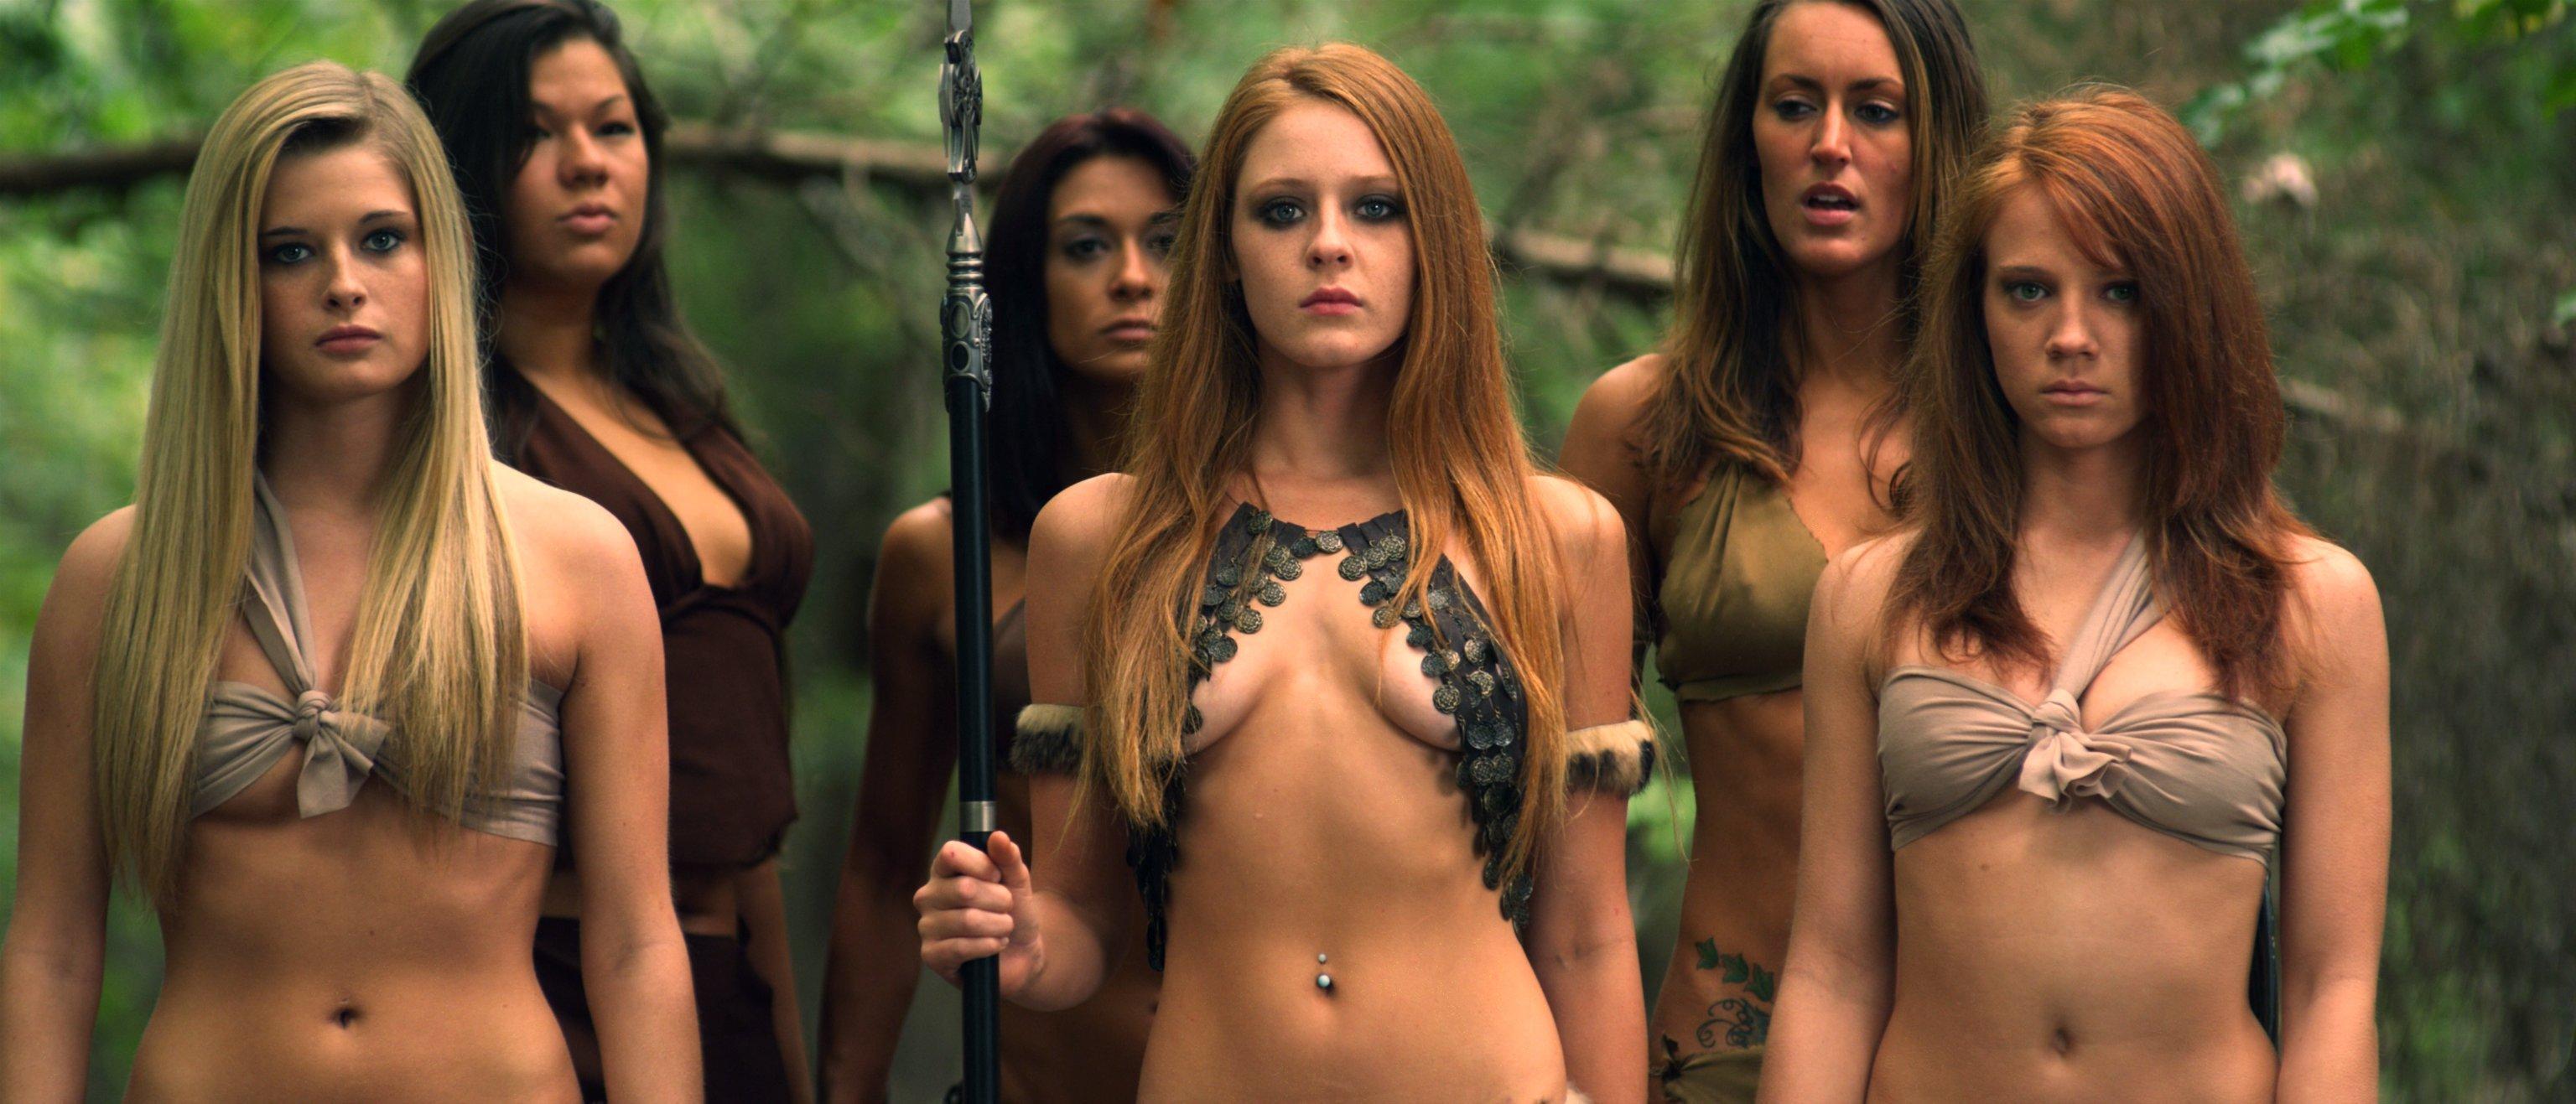 Inara, the Jungle Girl (2012)